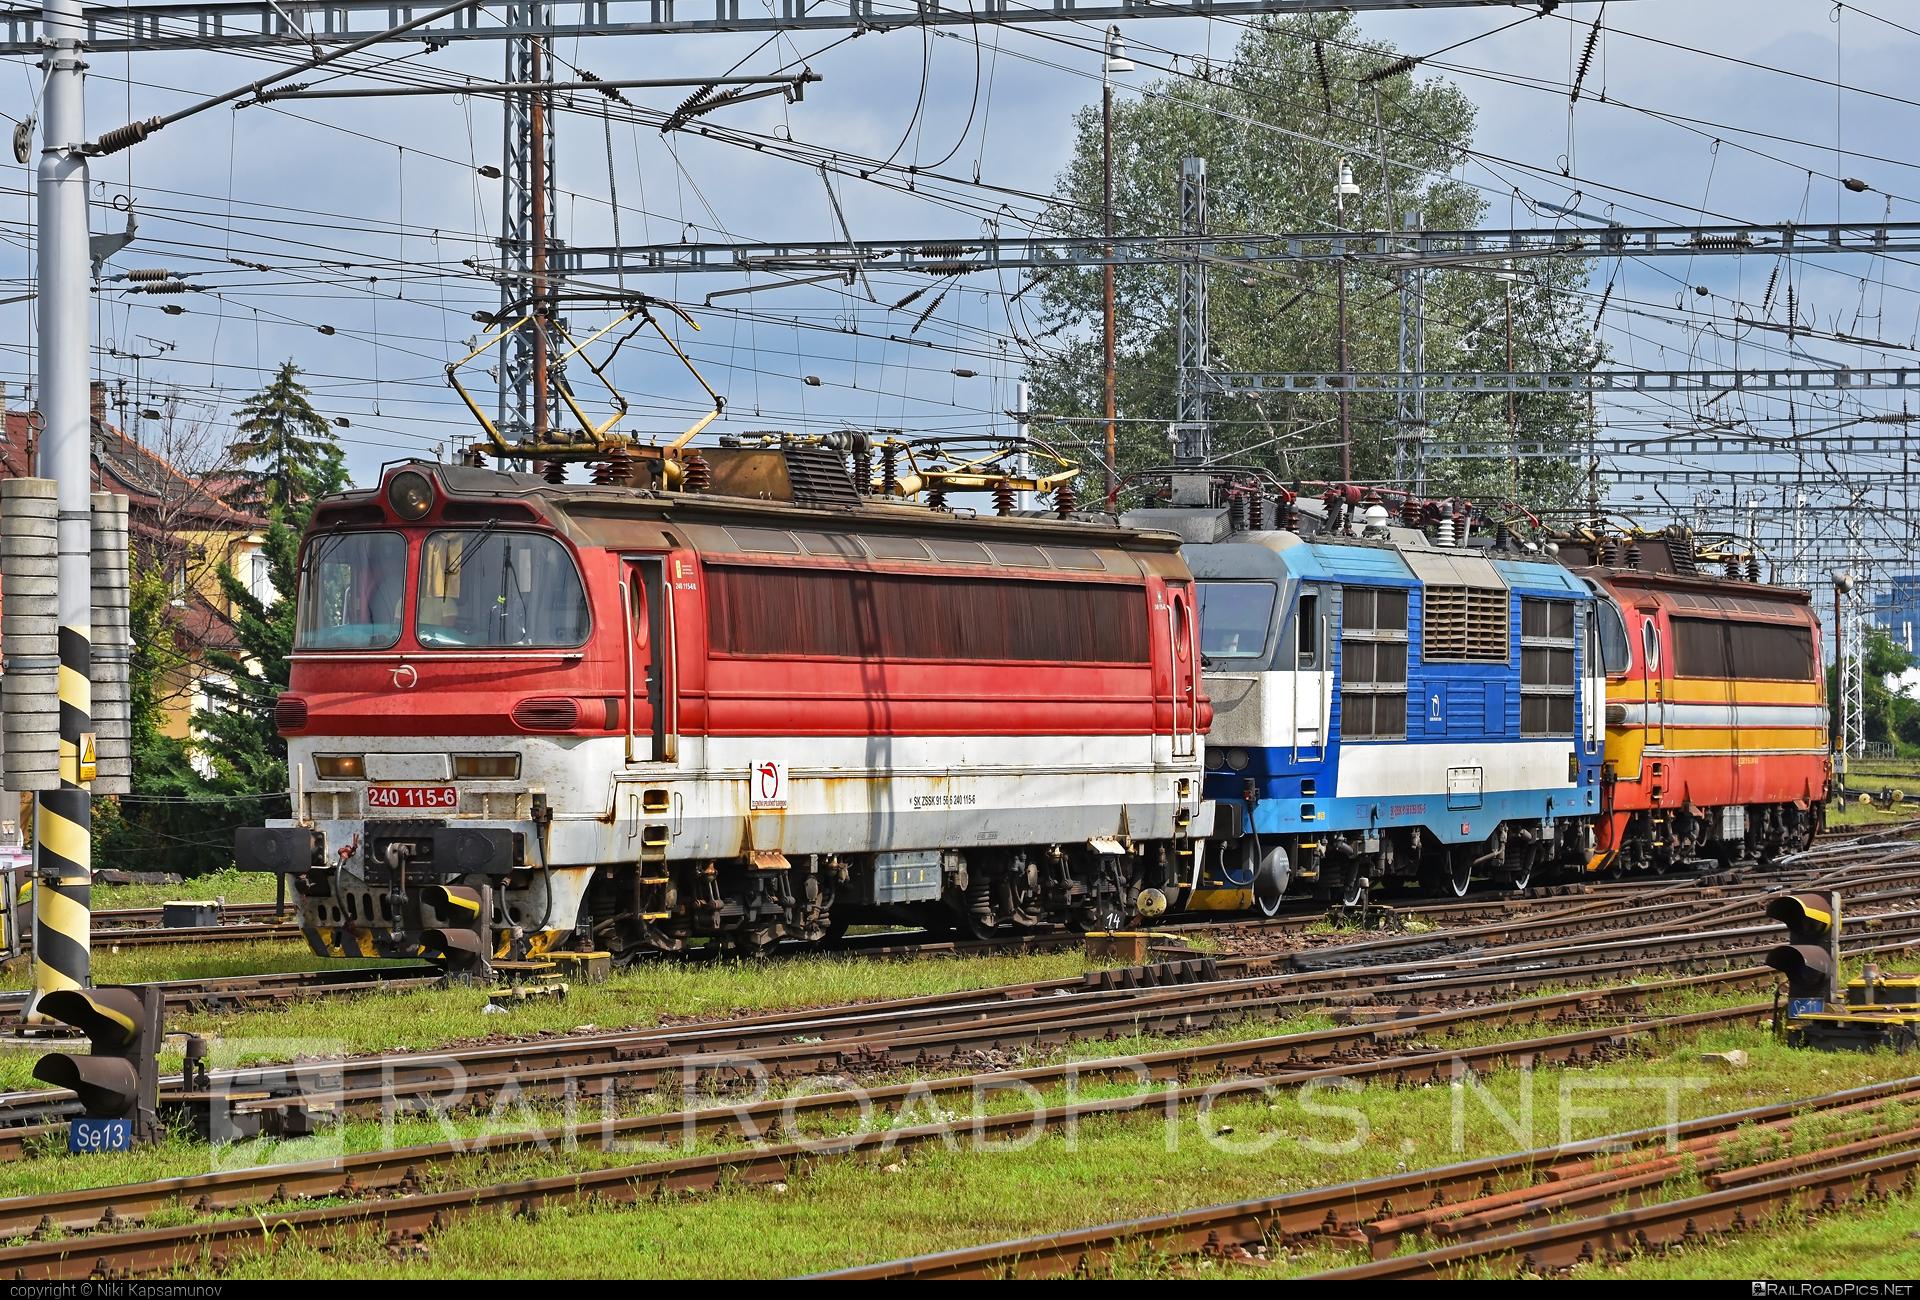 Škoda 47E - 240 115-6 operated by Železničná Spoločnost' Slovensko, a.s. #ZeleznicnaSpolocnostSlovensko #laminatka #locomotive240 #skoda #skoda47e #zssk